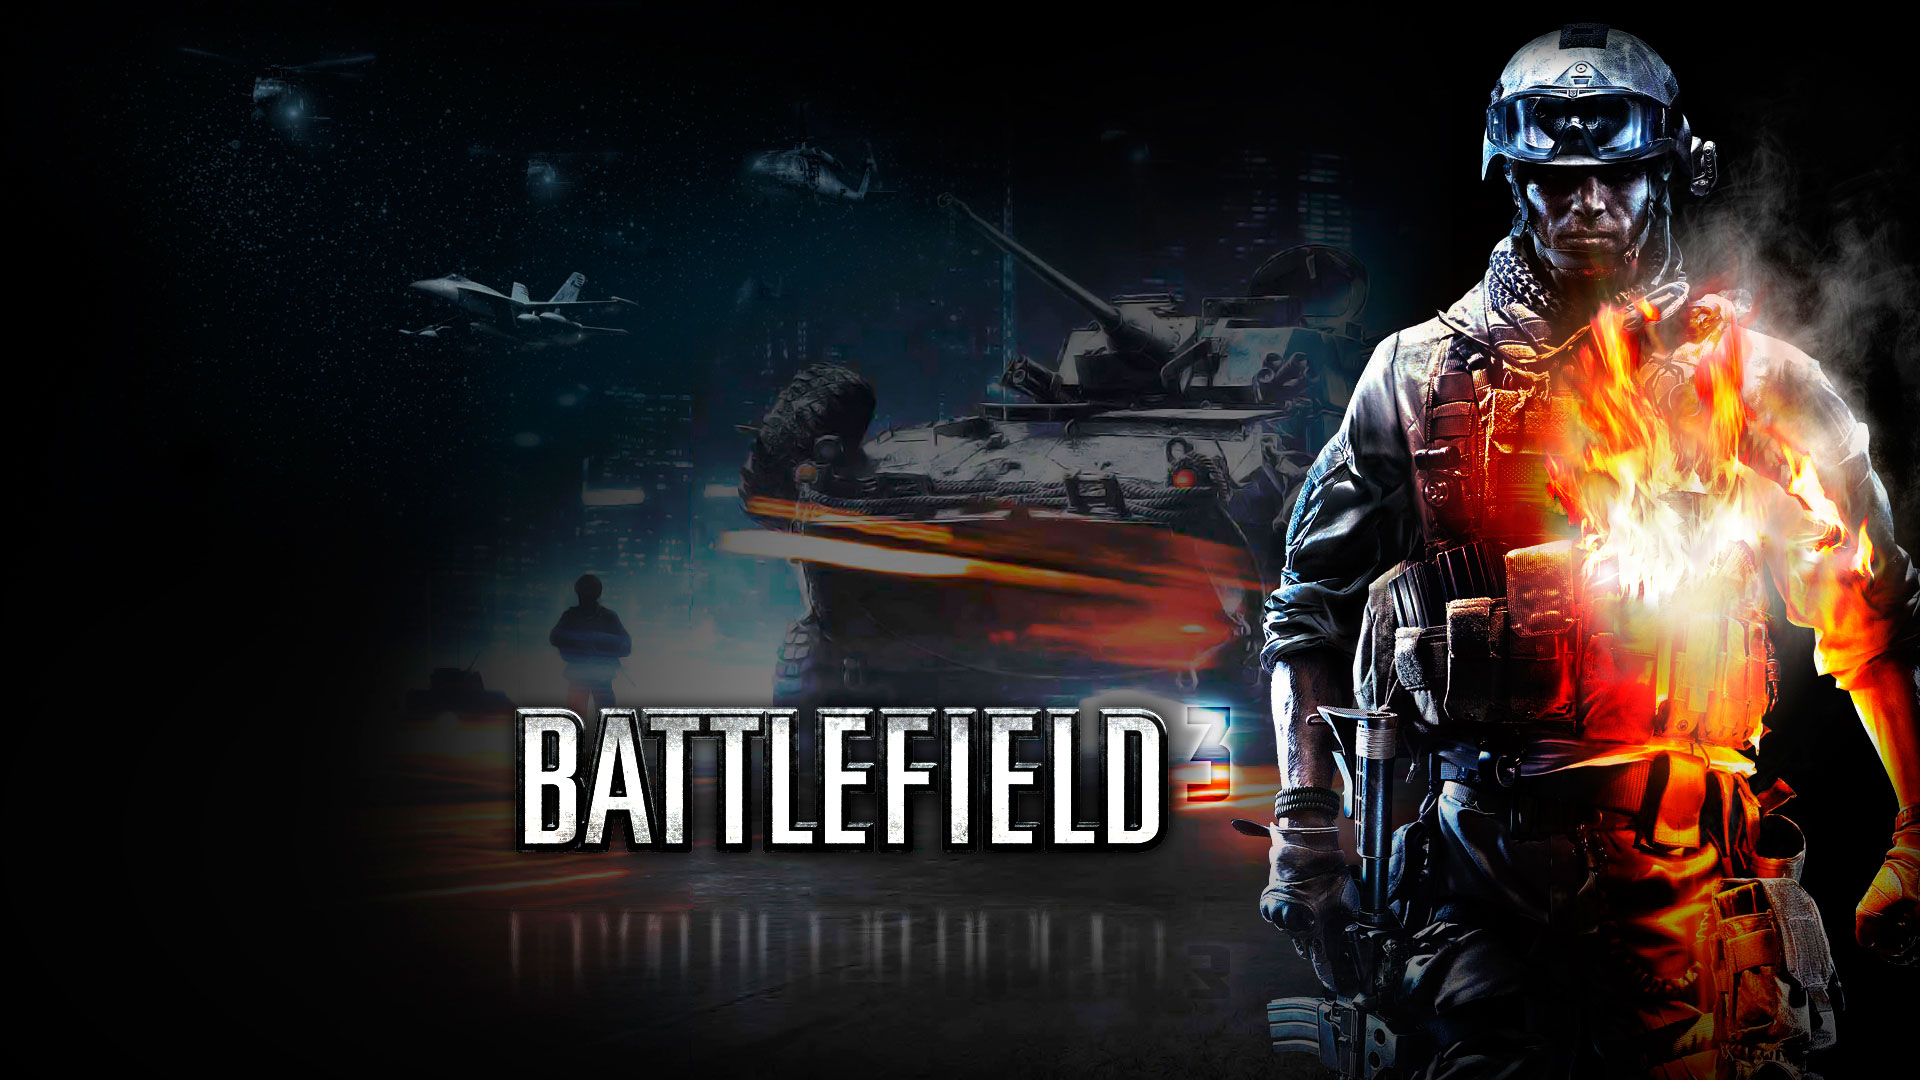 Megapost]Wallpapers de Call of Duty Mw3 y Battlefield 3   Taringa 1920x1080